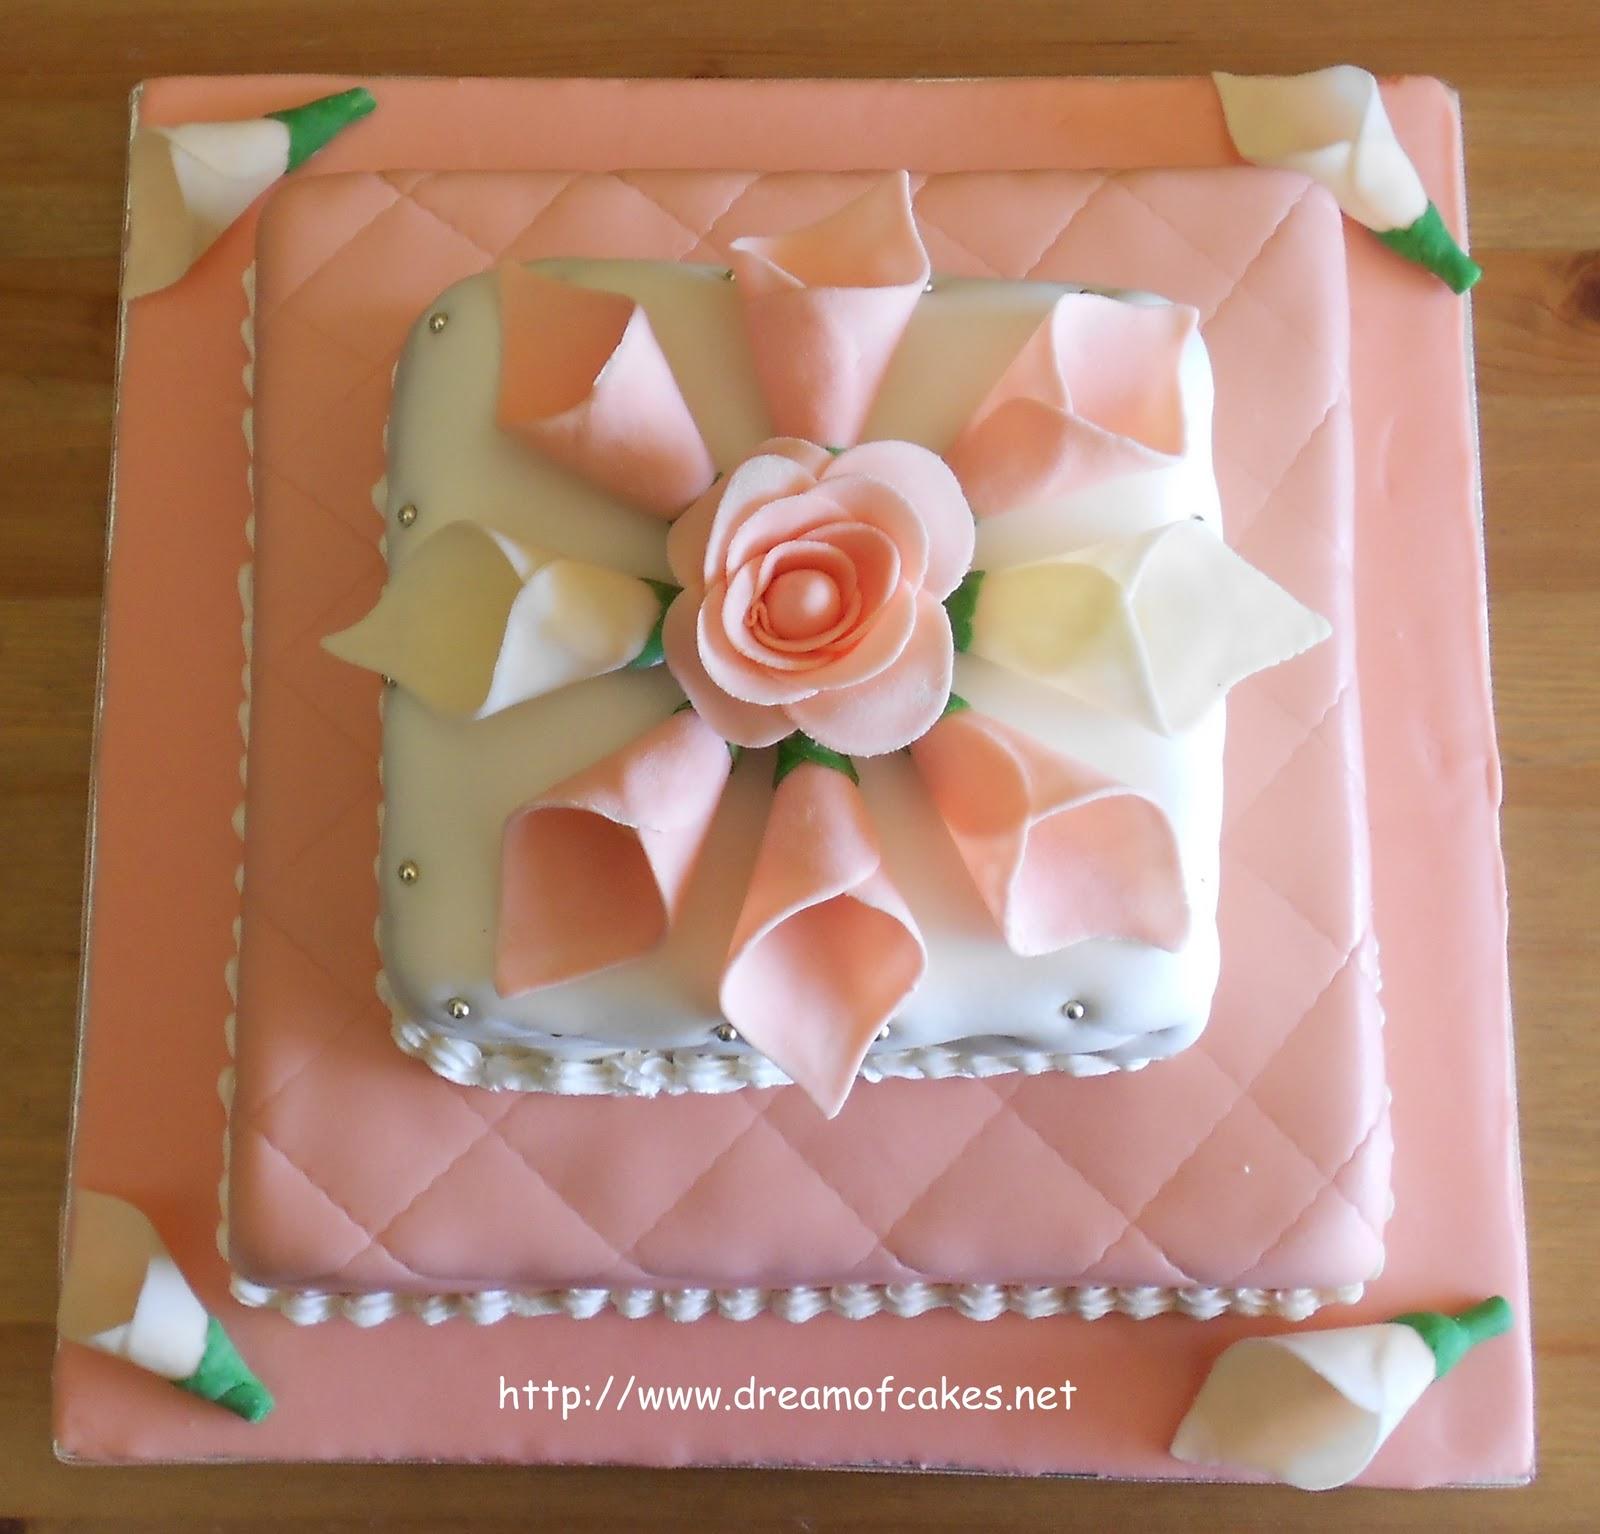 Dream of Cakes: Elegant Wedding Cake